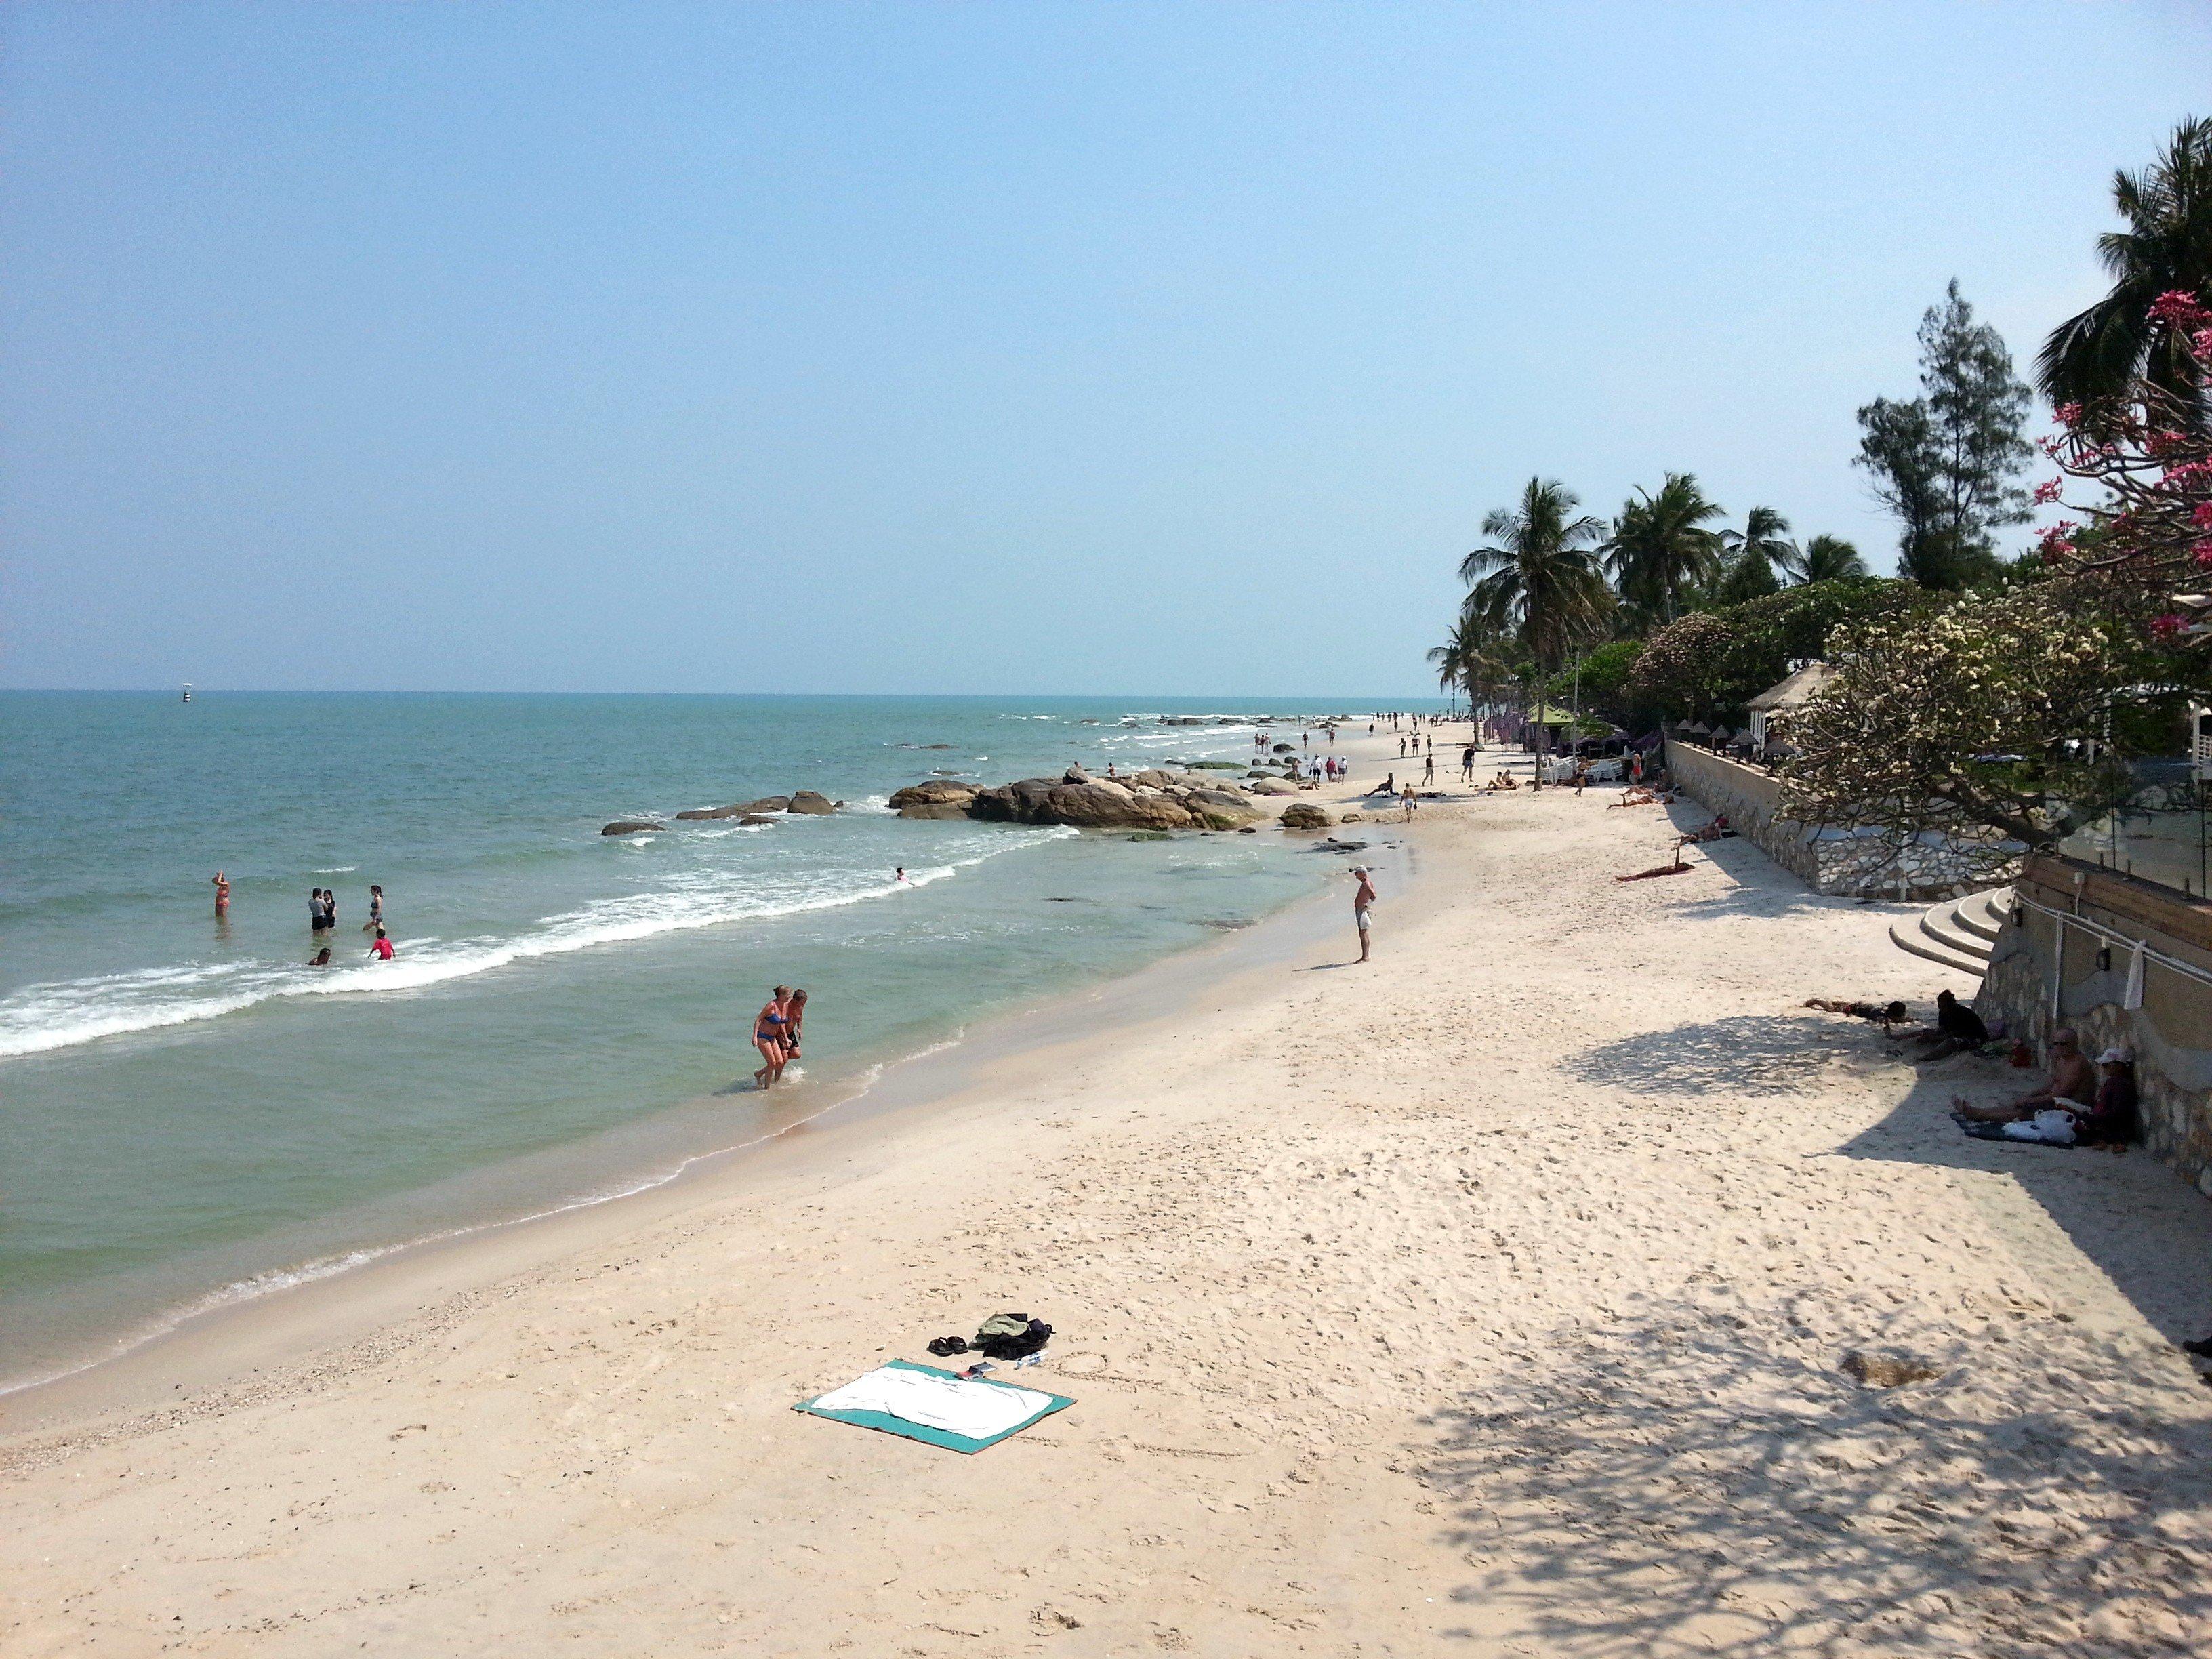 City centre beach in Hua Hin